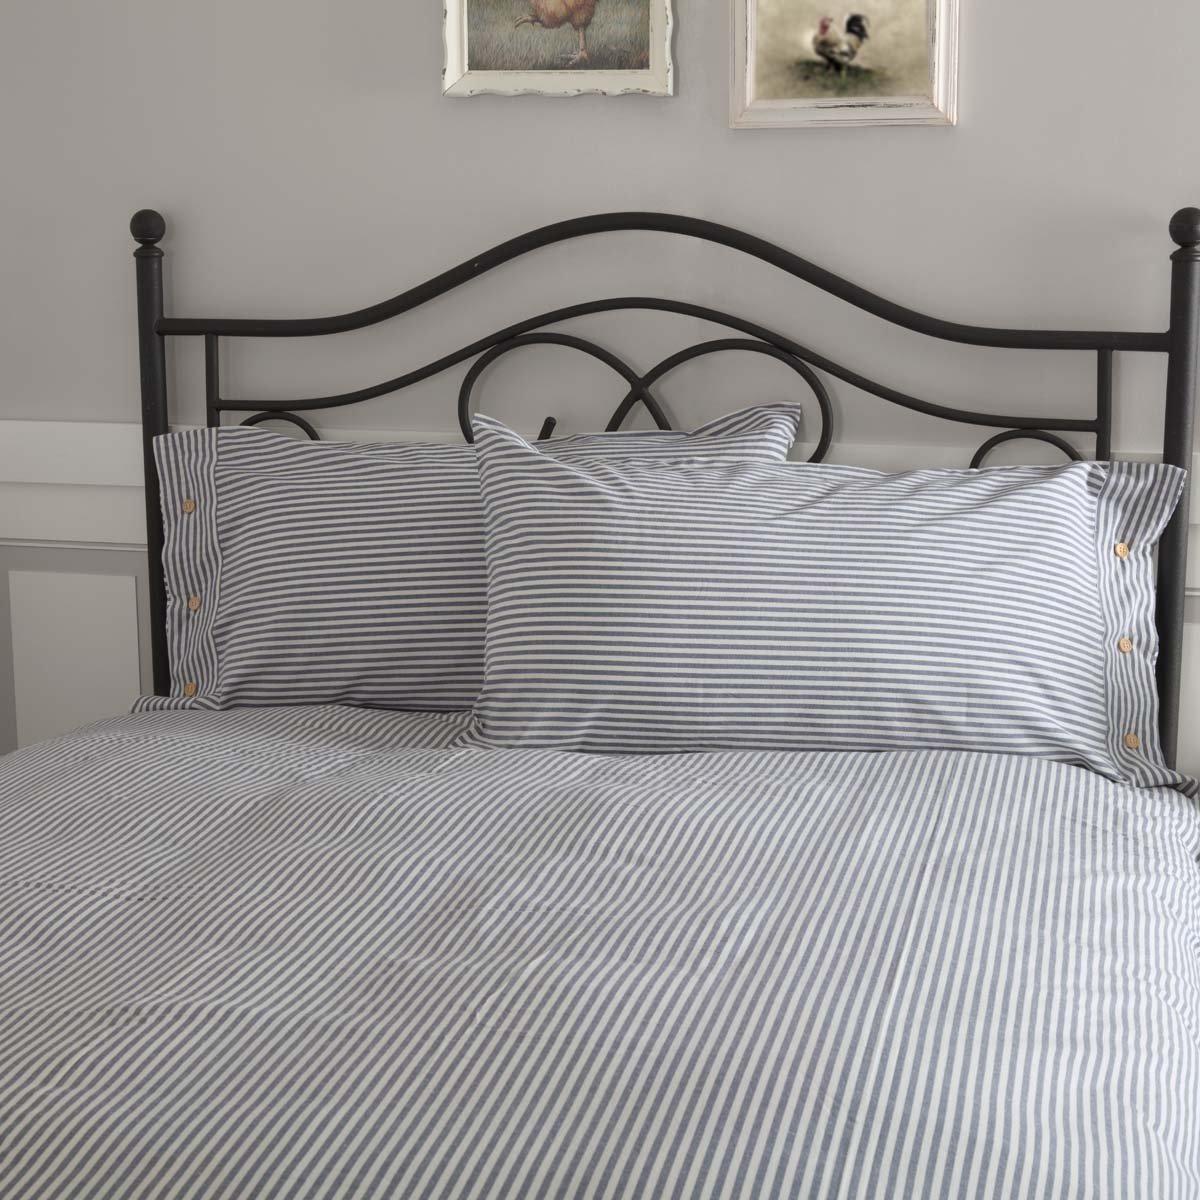 Piper Classics Farmhouse Ticking Stripe Blue King Sham, 21'' x 37'', Bed Pillow Cover